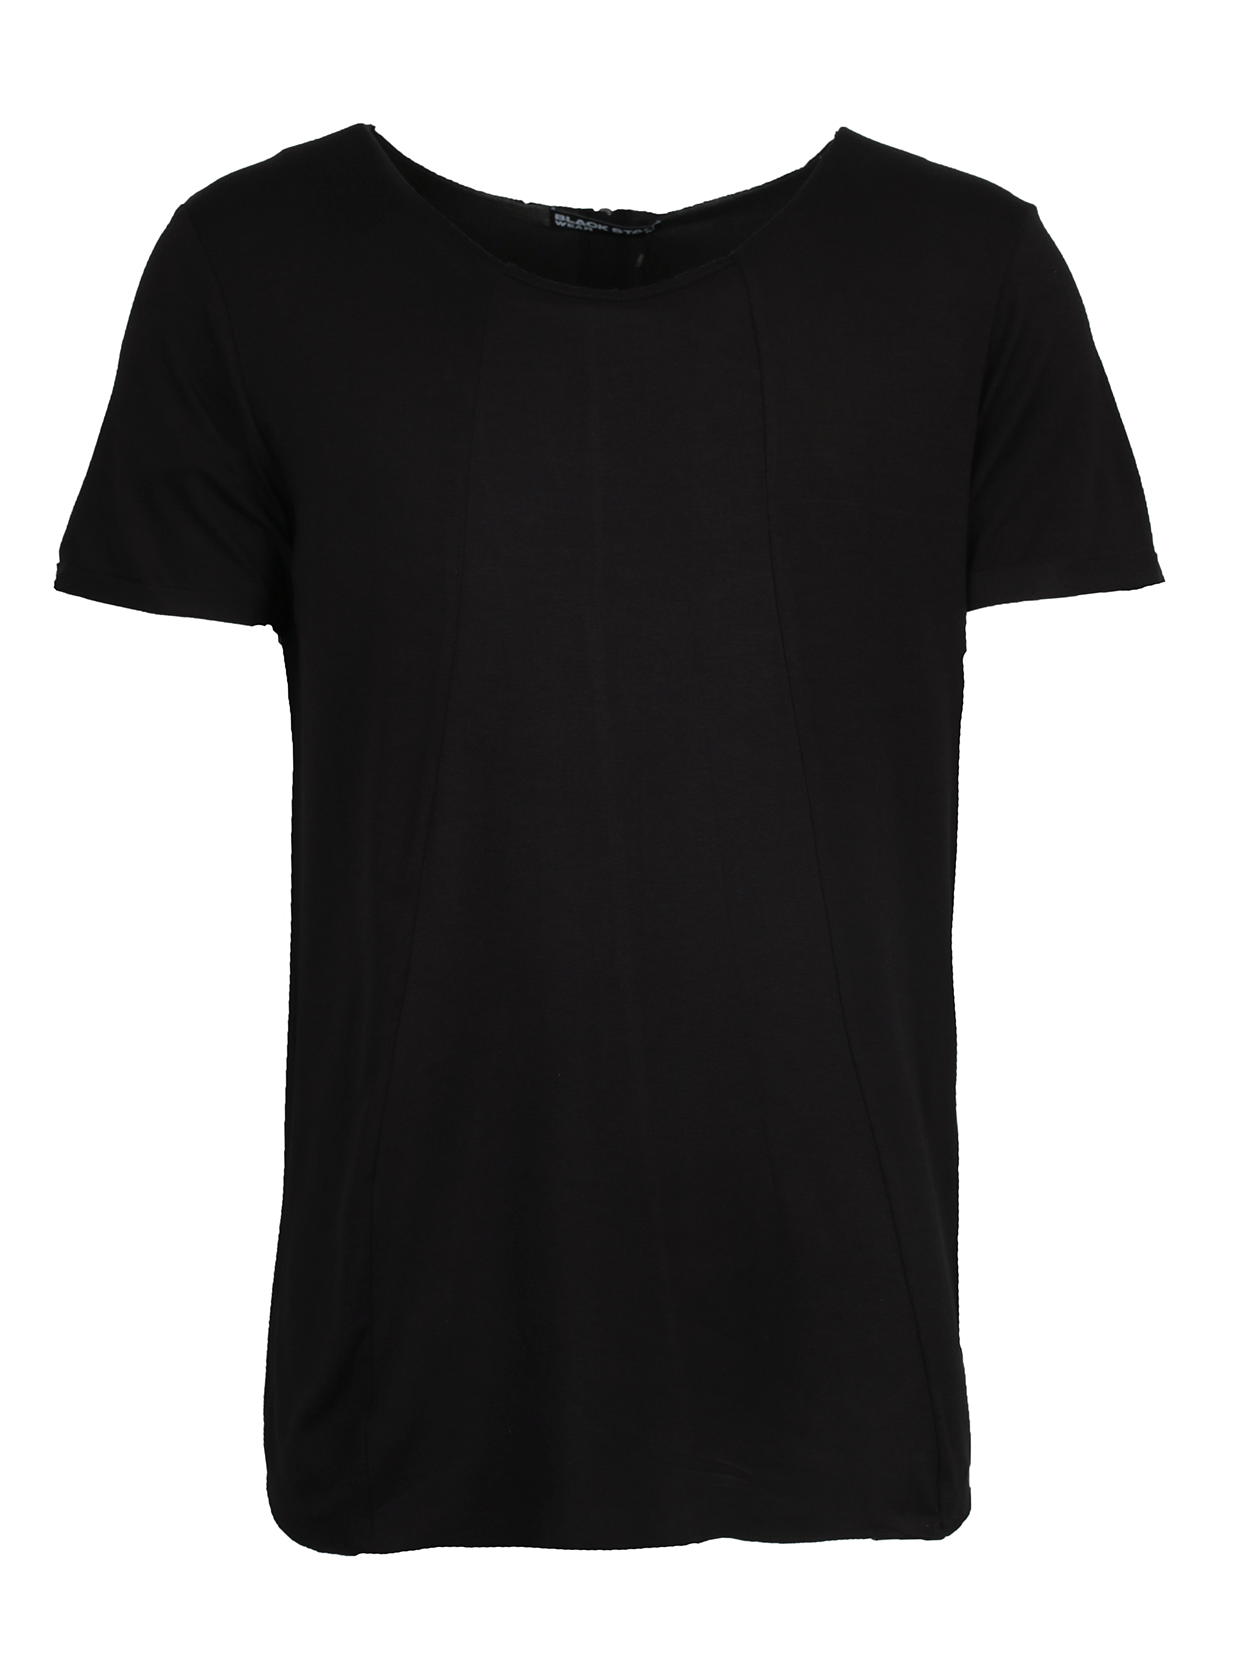 Футболка унисекс ZIPPER BLACK<br><br>Размер: L<br>Цвет: Черный<br>Пол: Женский